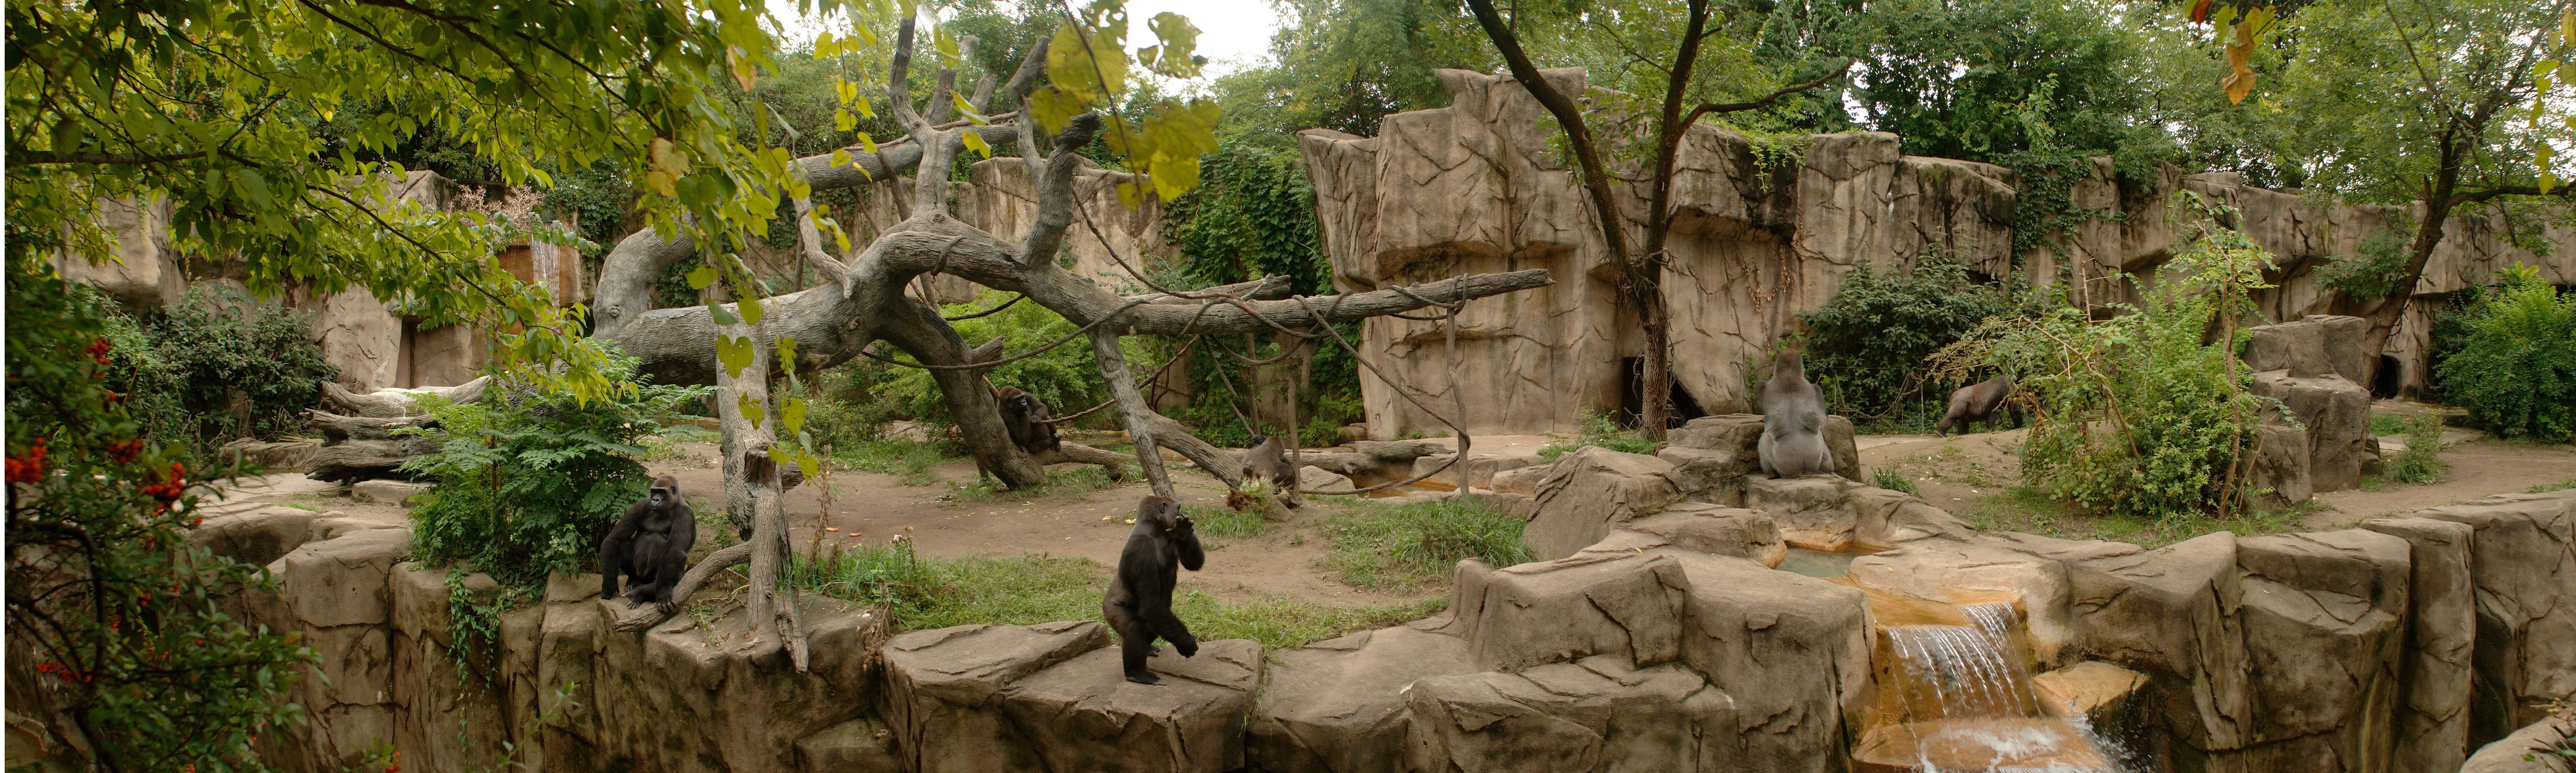 Samantha  The Grand Old Lady of the Cincinnati Zoo   Cincinnati Zoo